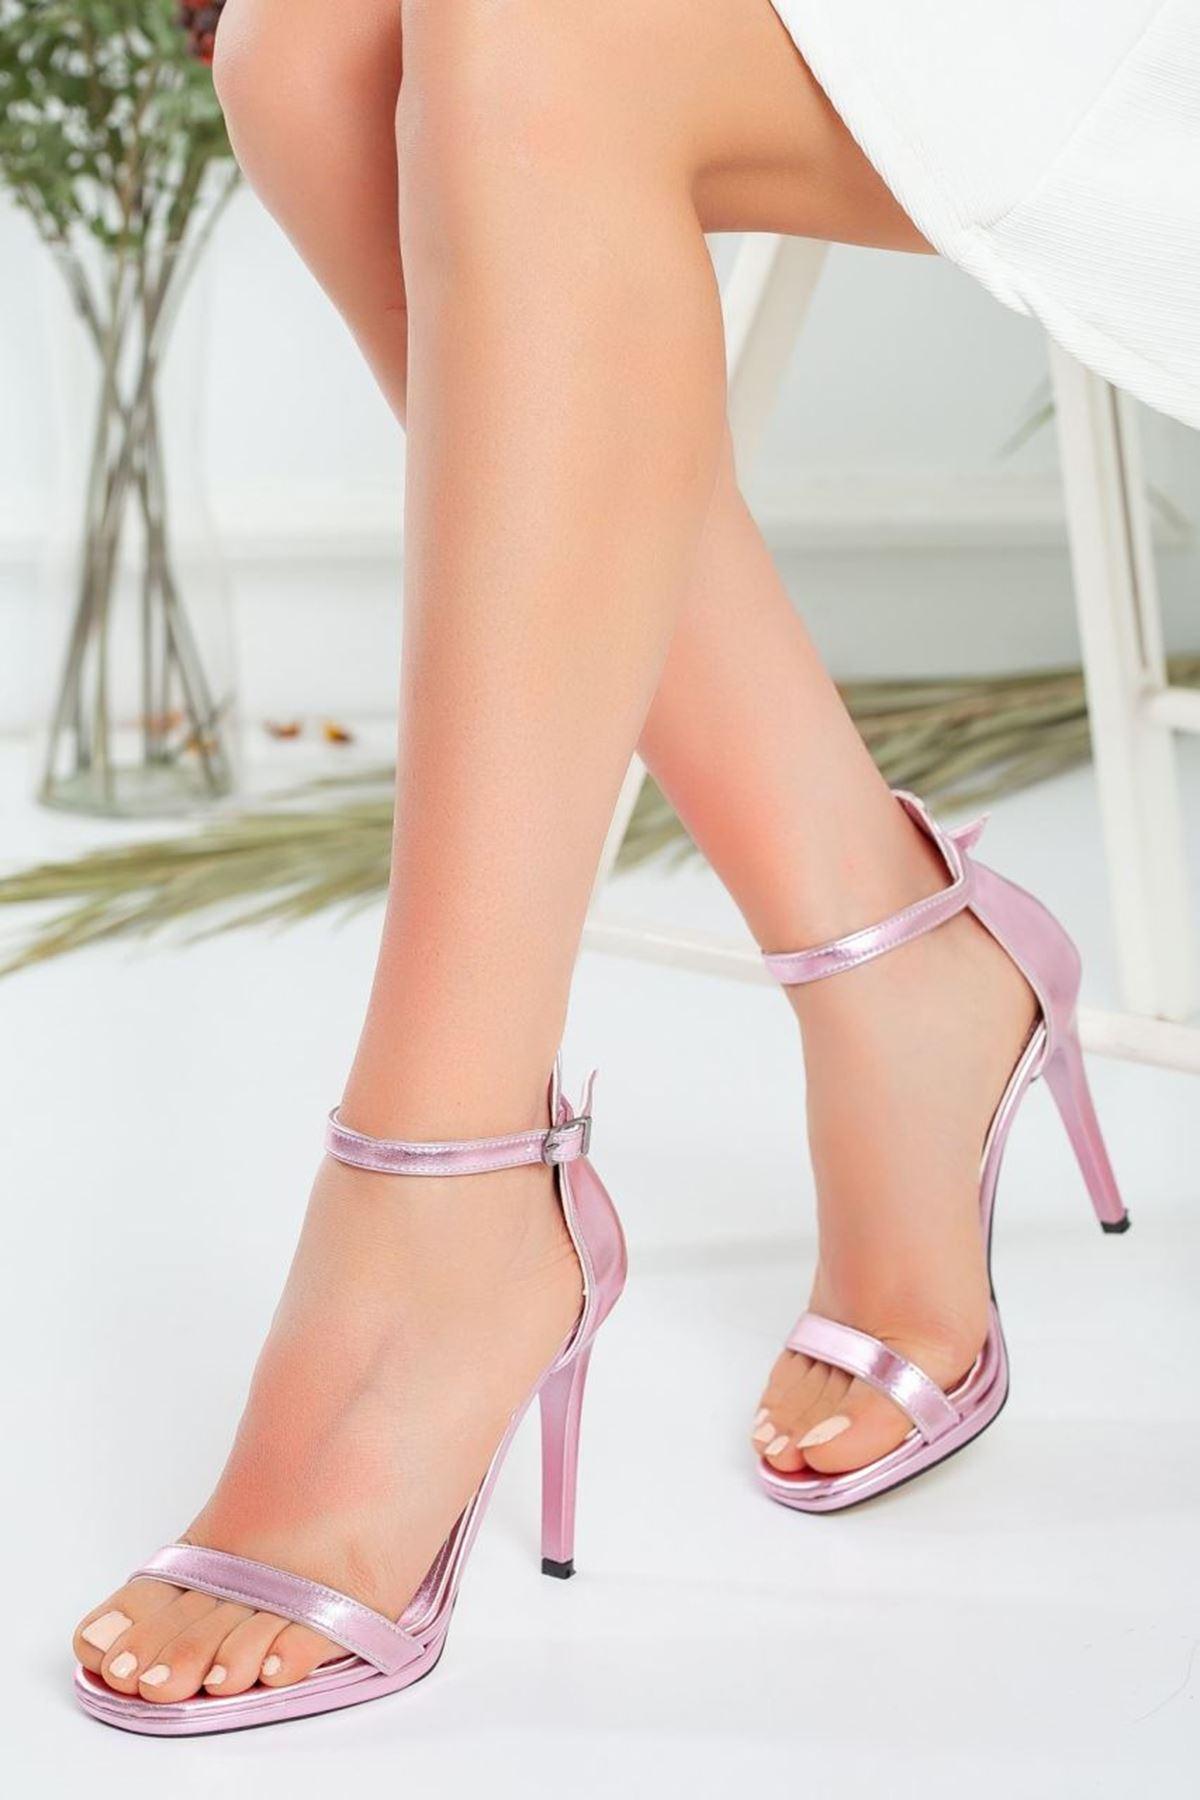 Kadın Natis Yüksek Topuklu Ayakkabı Metalik Pembe